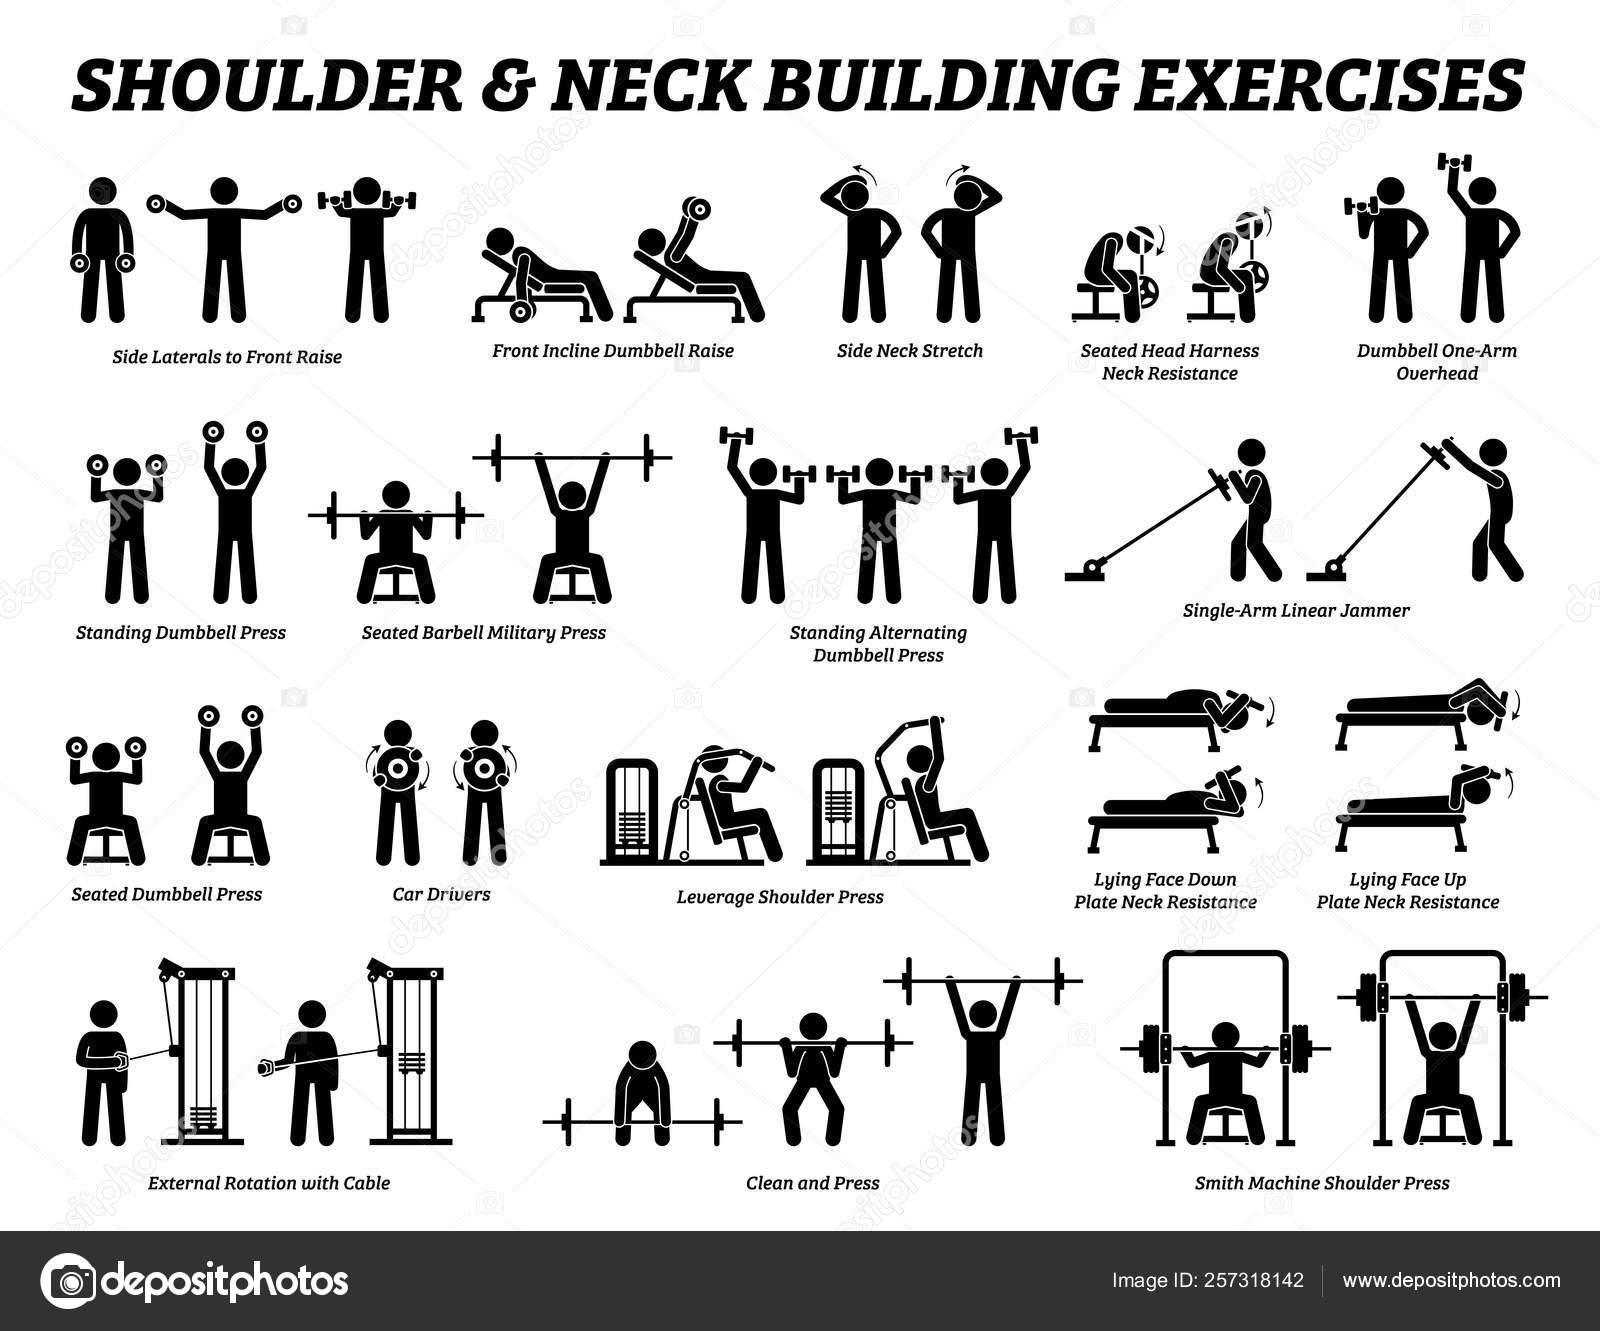 Shoulder Neck Building Exercise Muscle Building Stick